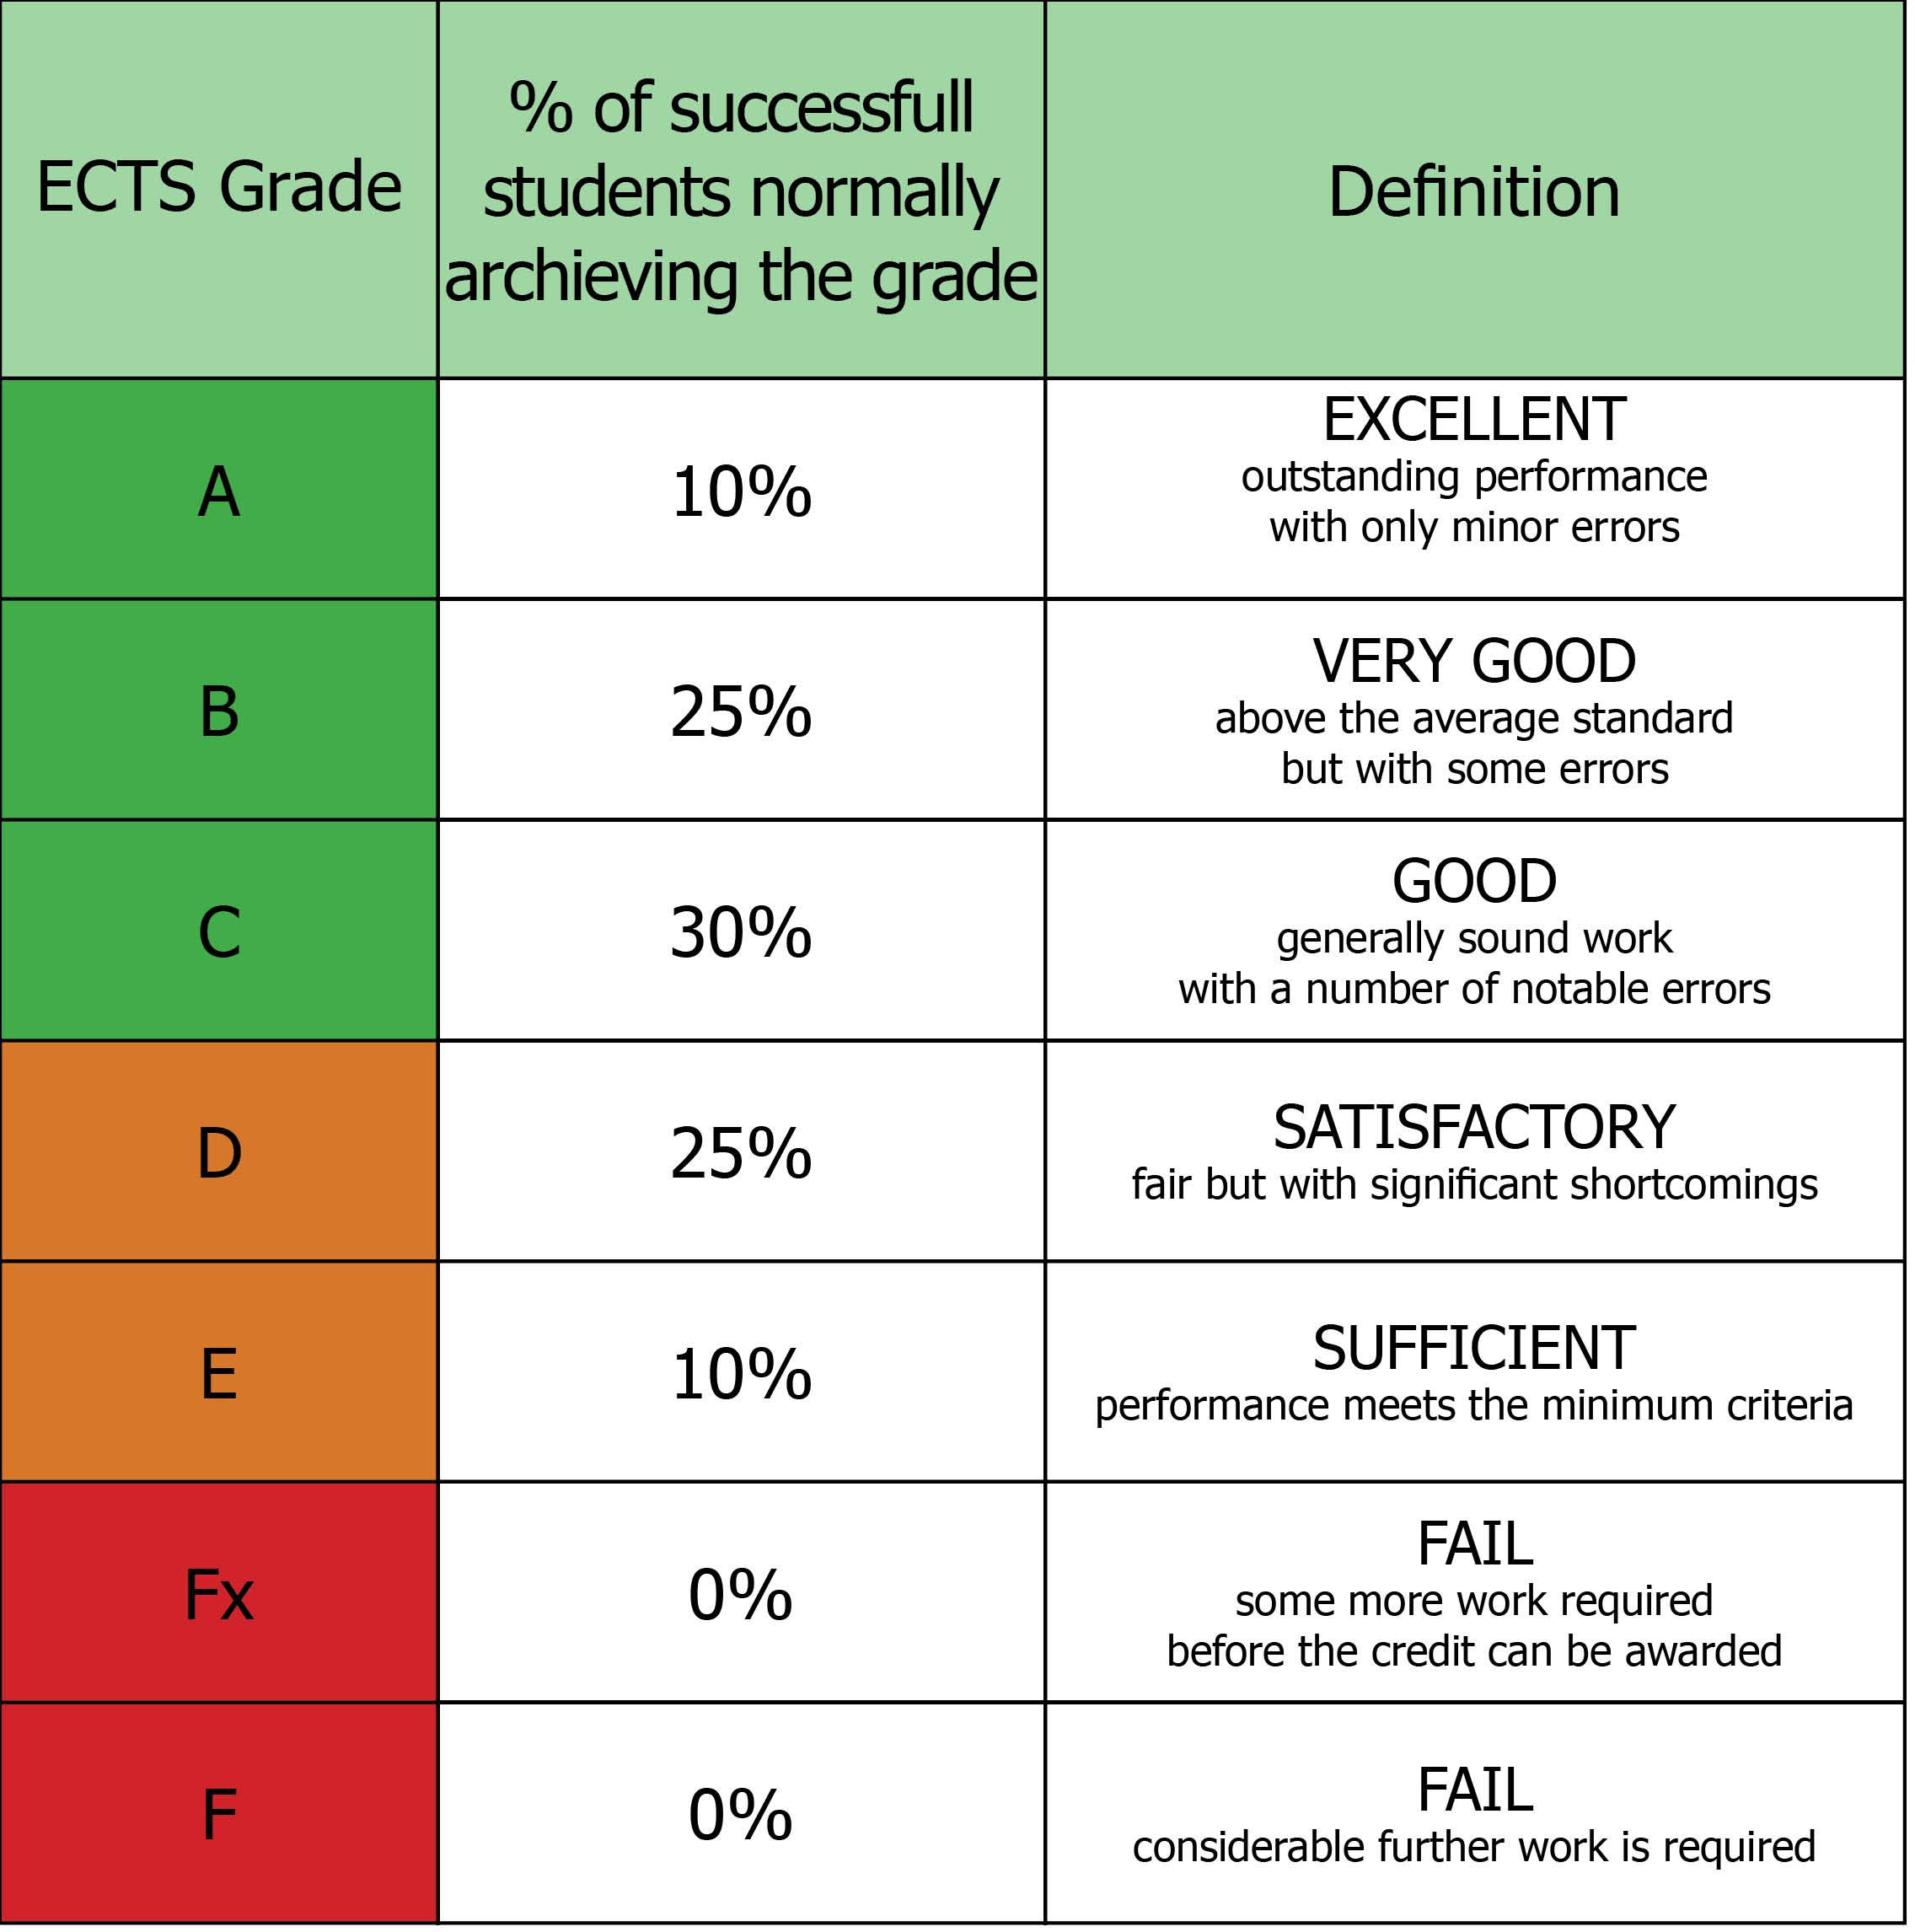 Ects Grade